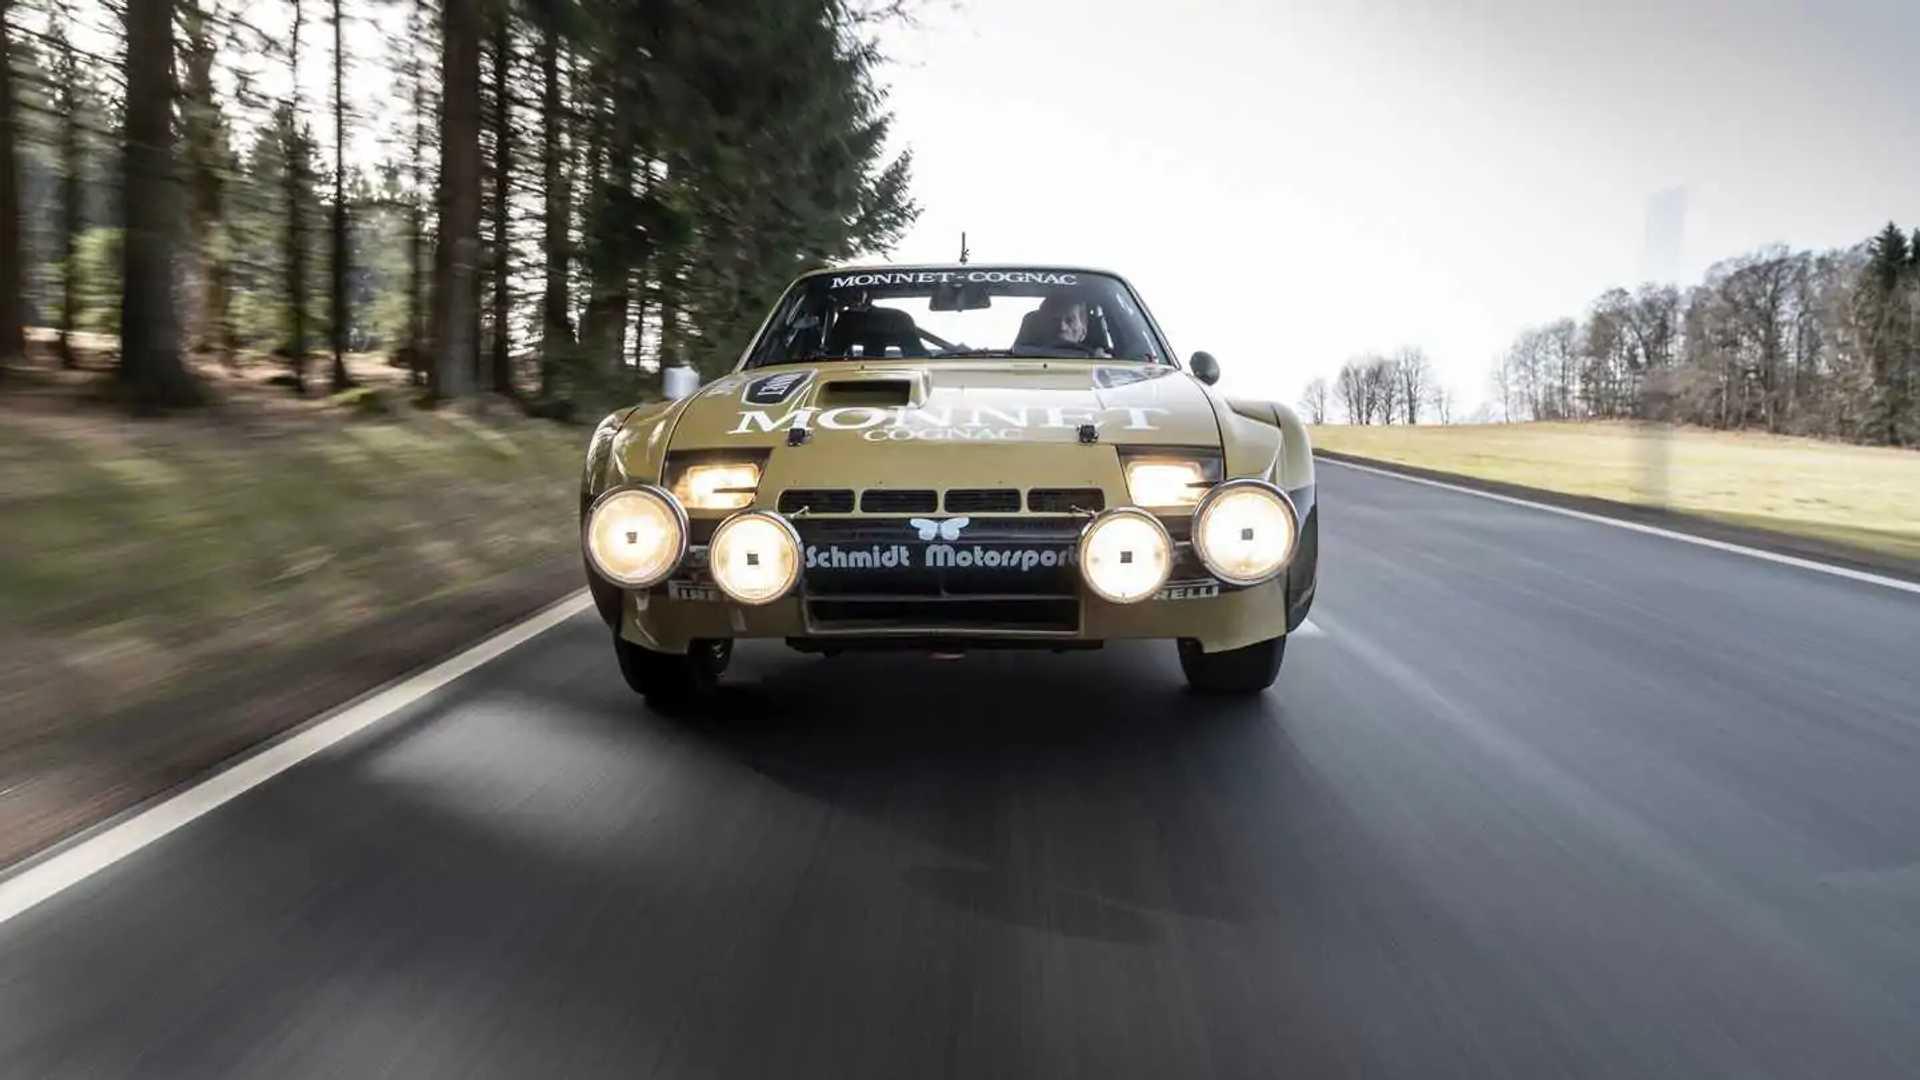 1981 Porsche 924 Carrera GTS Rally